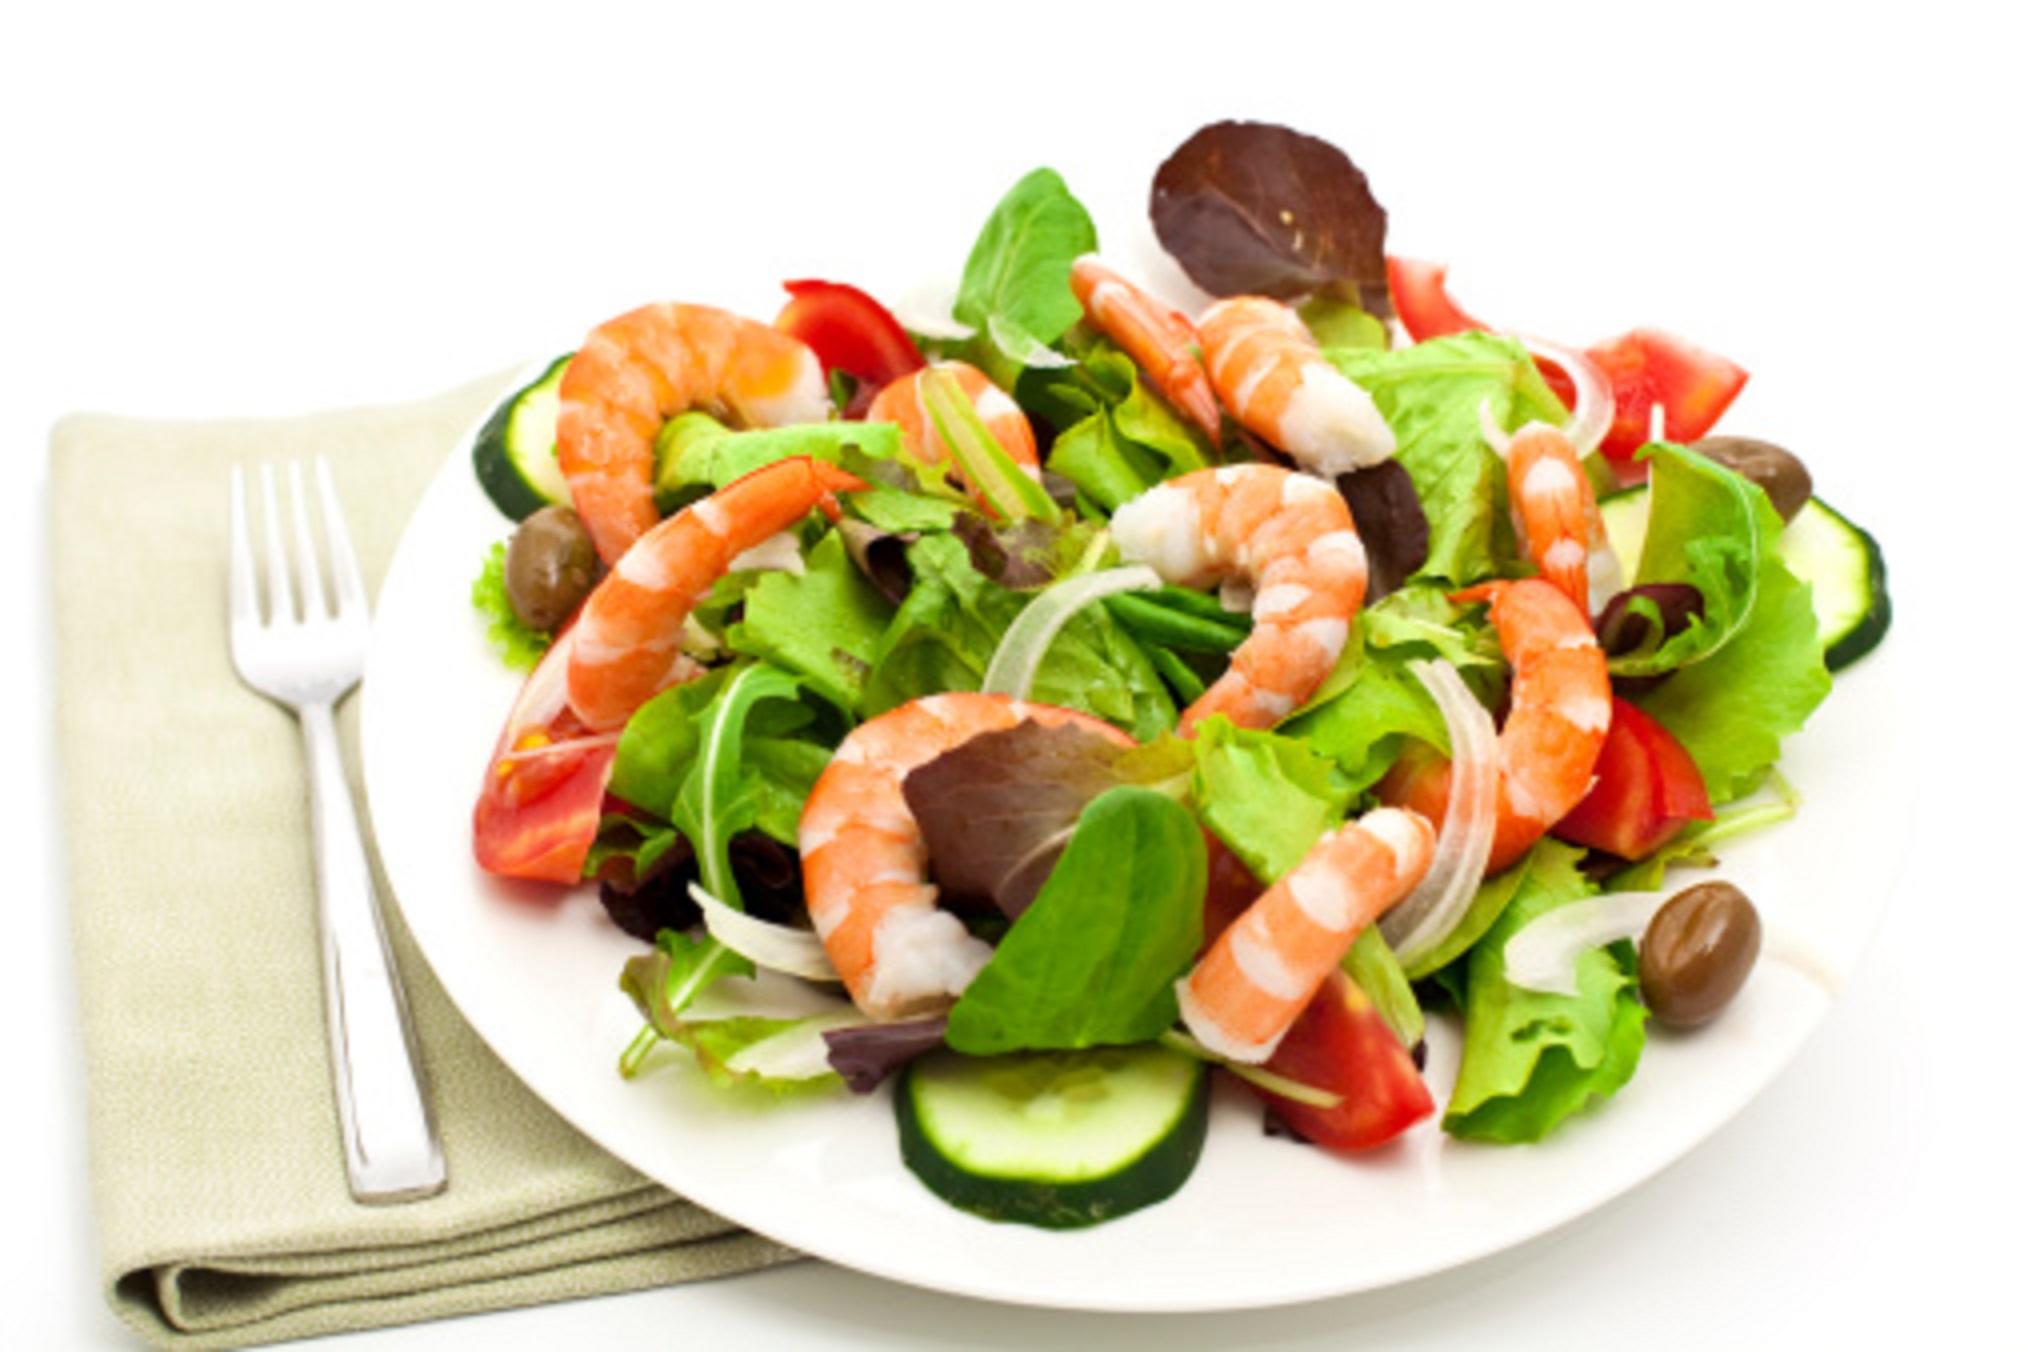 Dieta mediterranea ateneo del gusto - La mediterranea ...